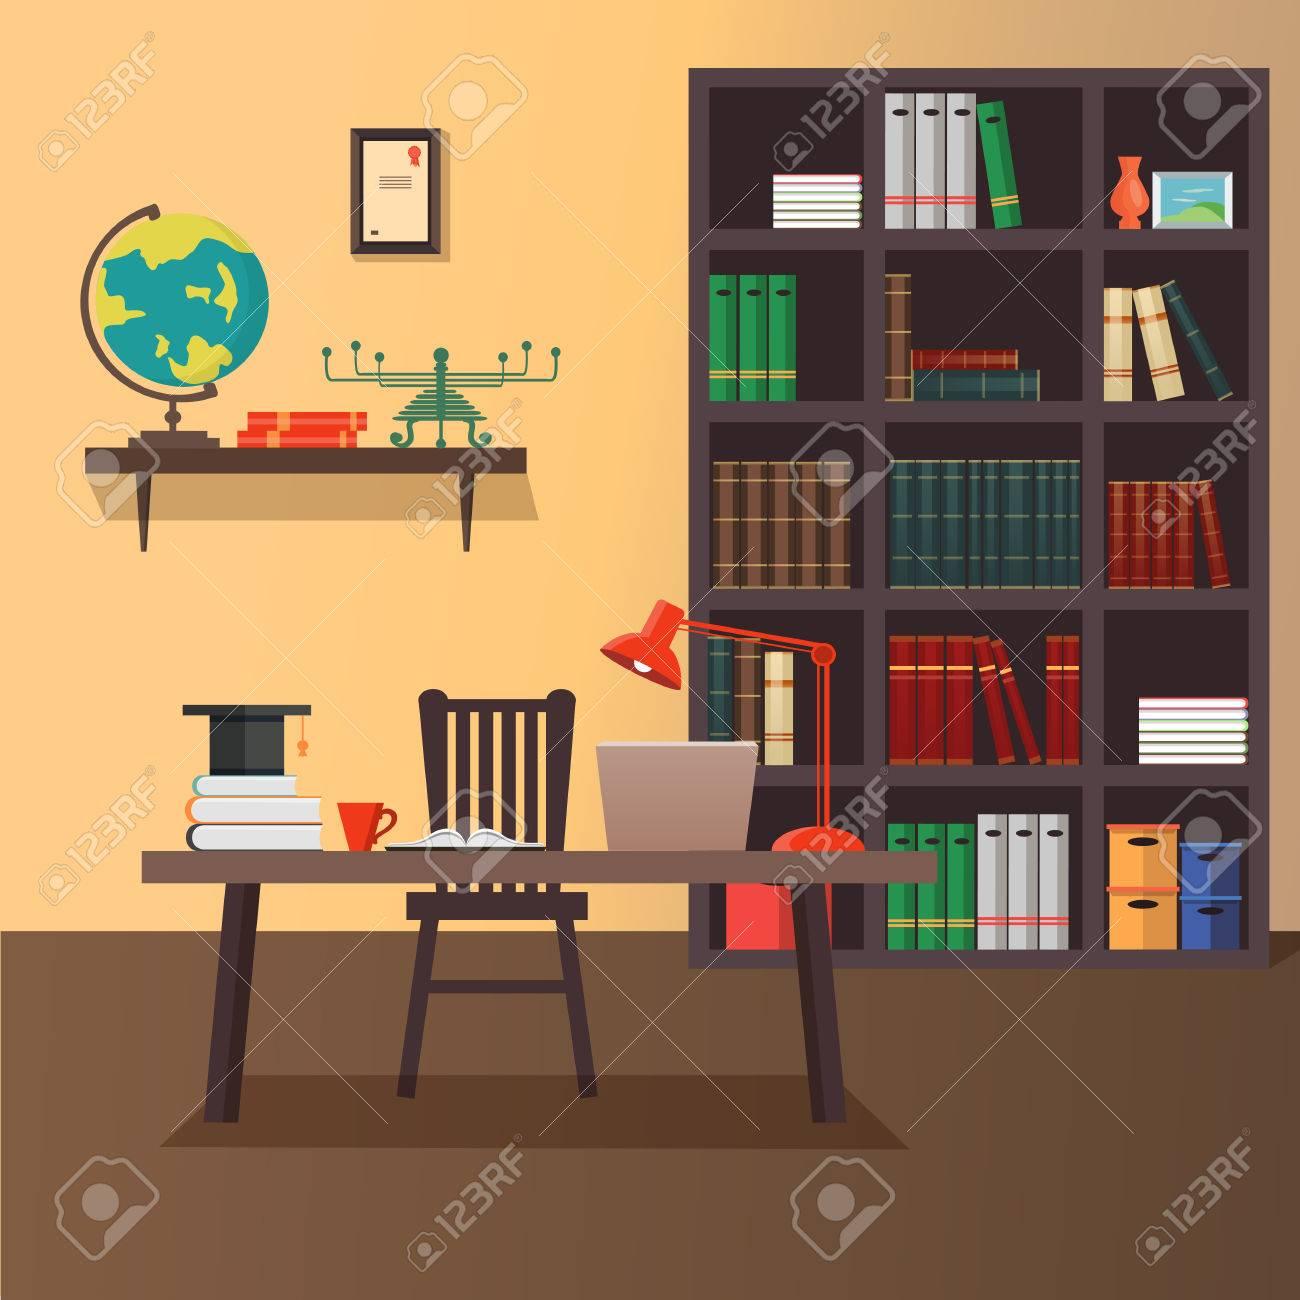 geeks home office workspace. Home Office Workspace. Illustration Of Modern Flat Minimalistic Style. Design Geeks Workspace L